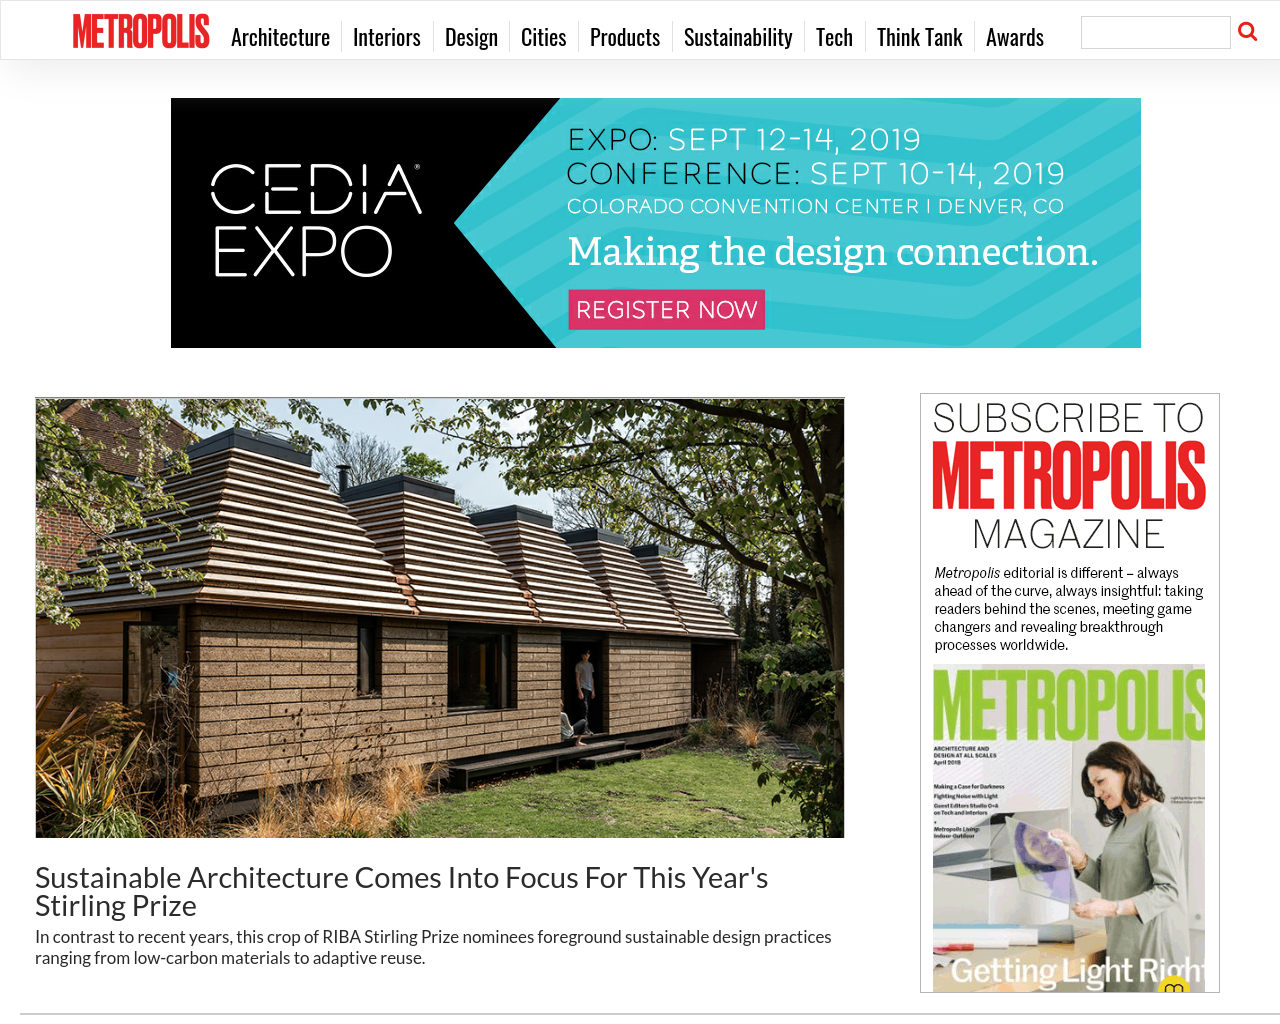 Metropolis Magazine Advertising Mediakits, Reviews, Pricing, Traffic